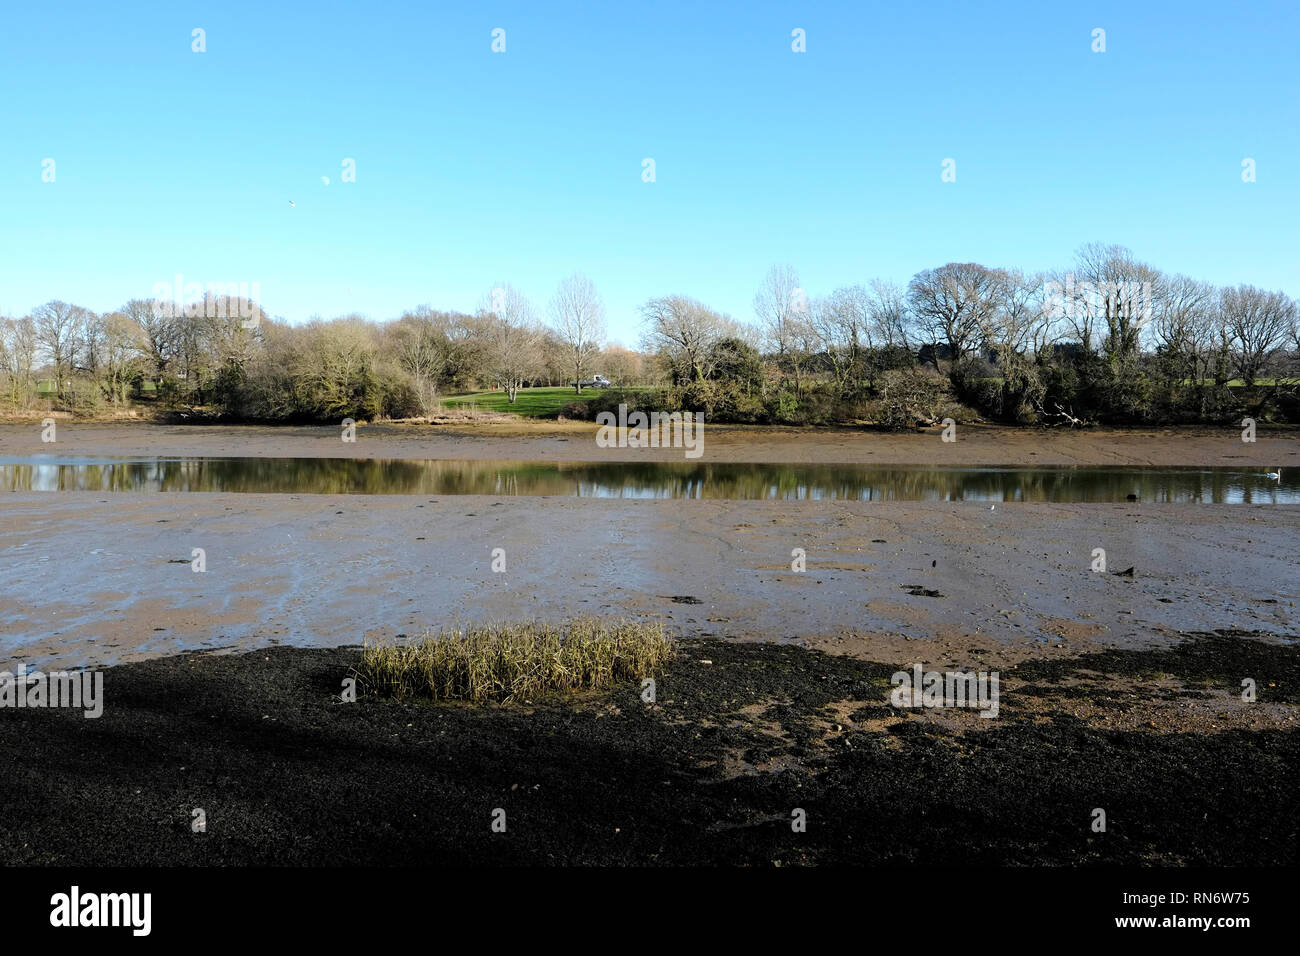 Banks of the Medina River at Newport, Isle of Wight, England, UK. Stock Photo